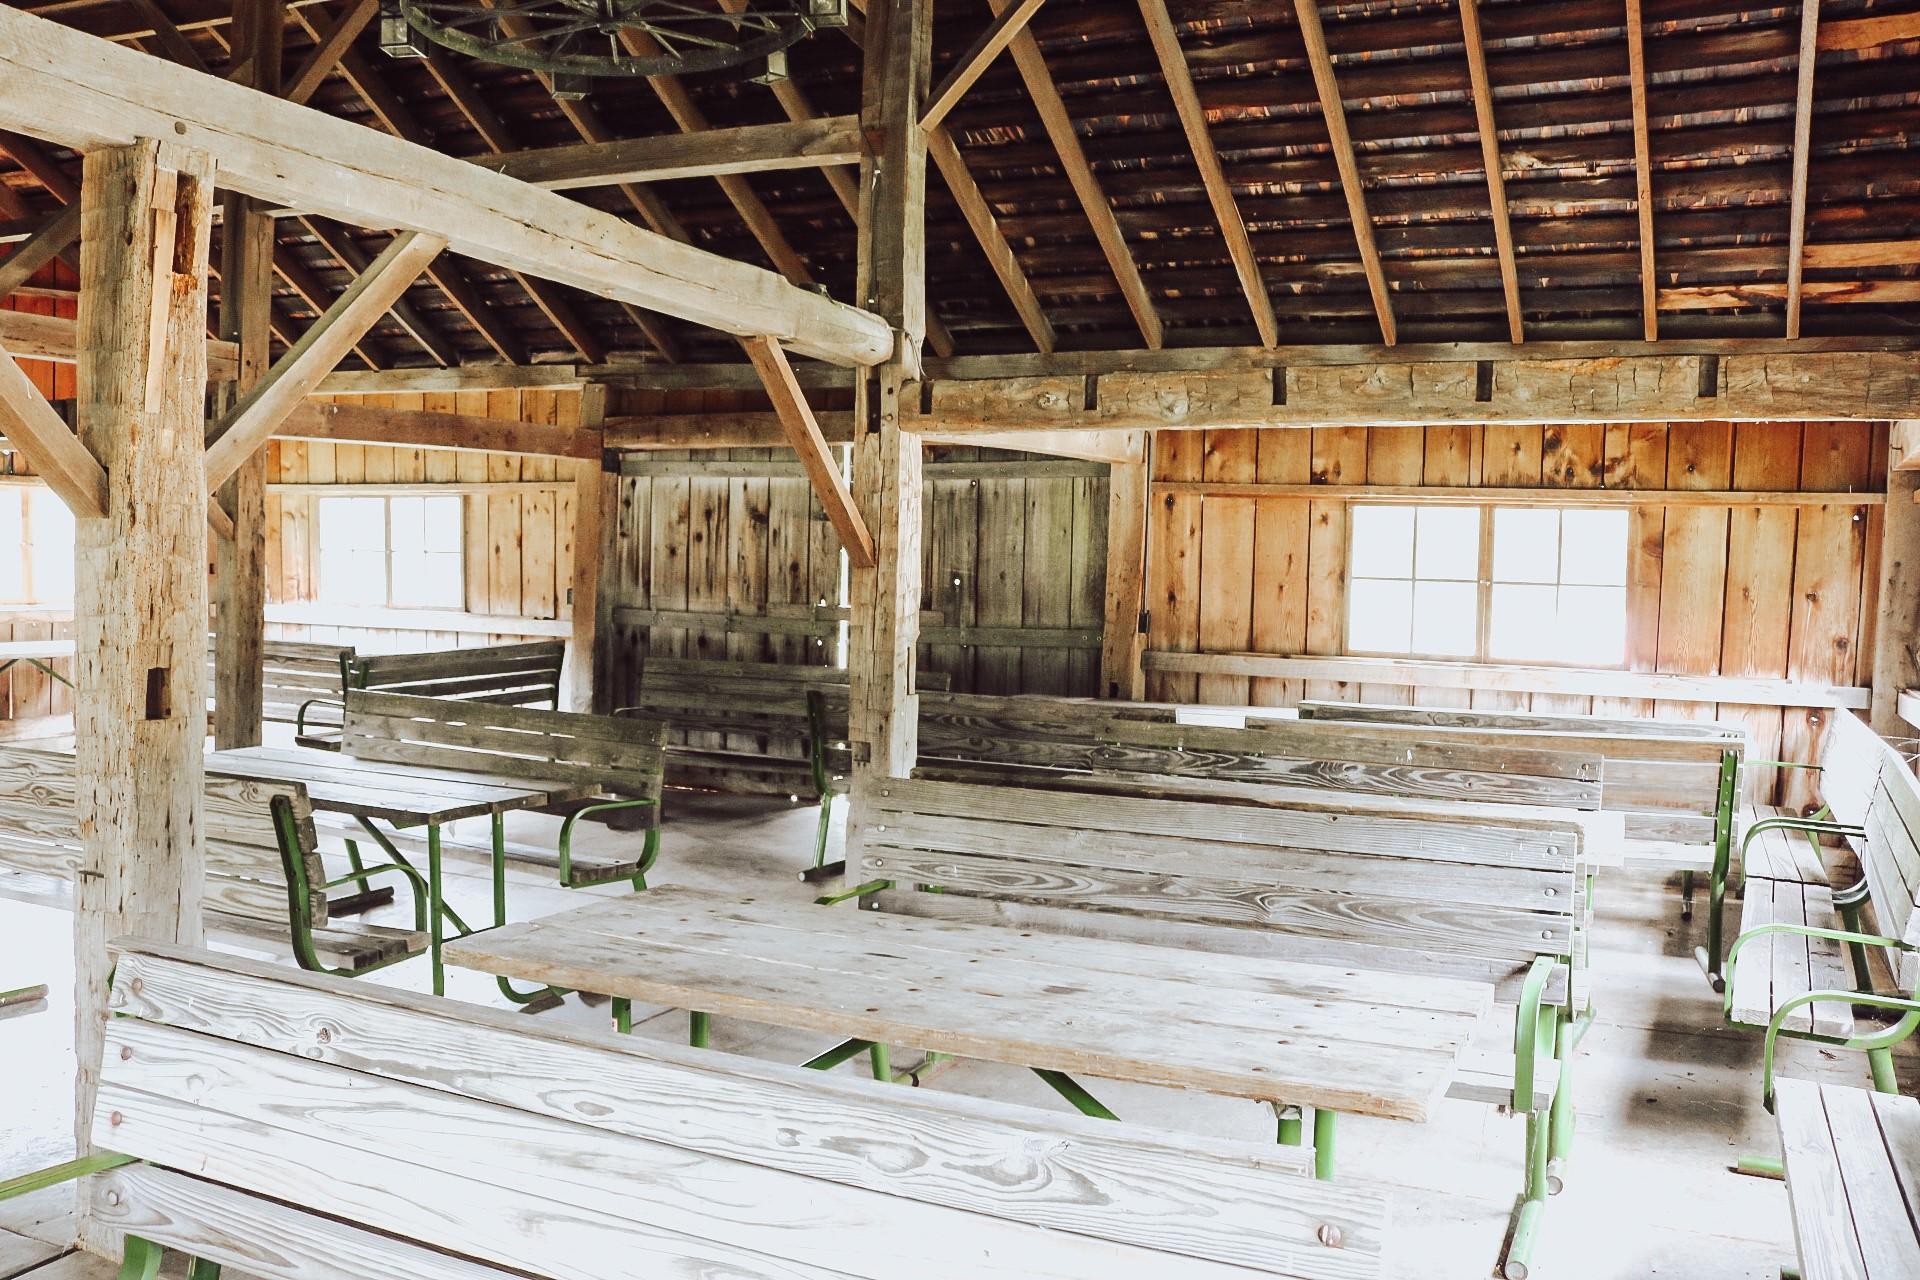 Audubon Barn inside